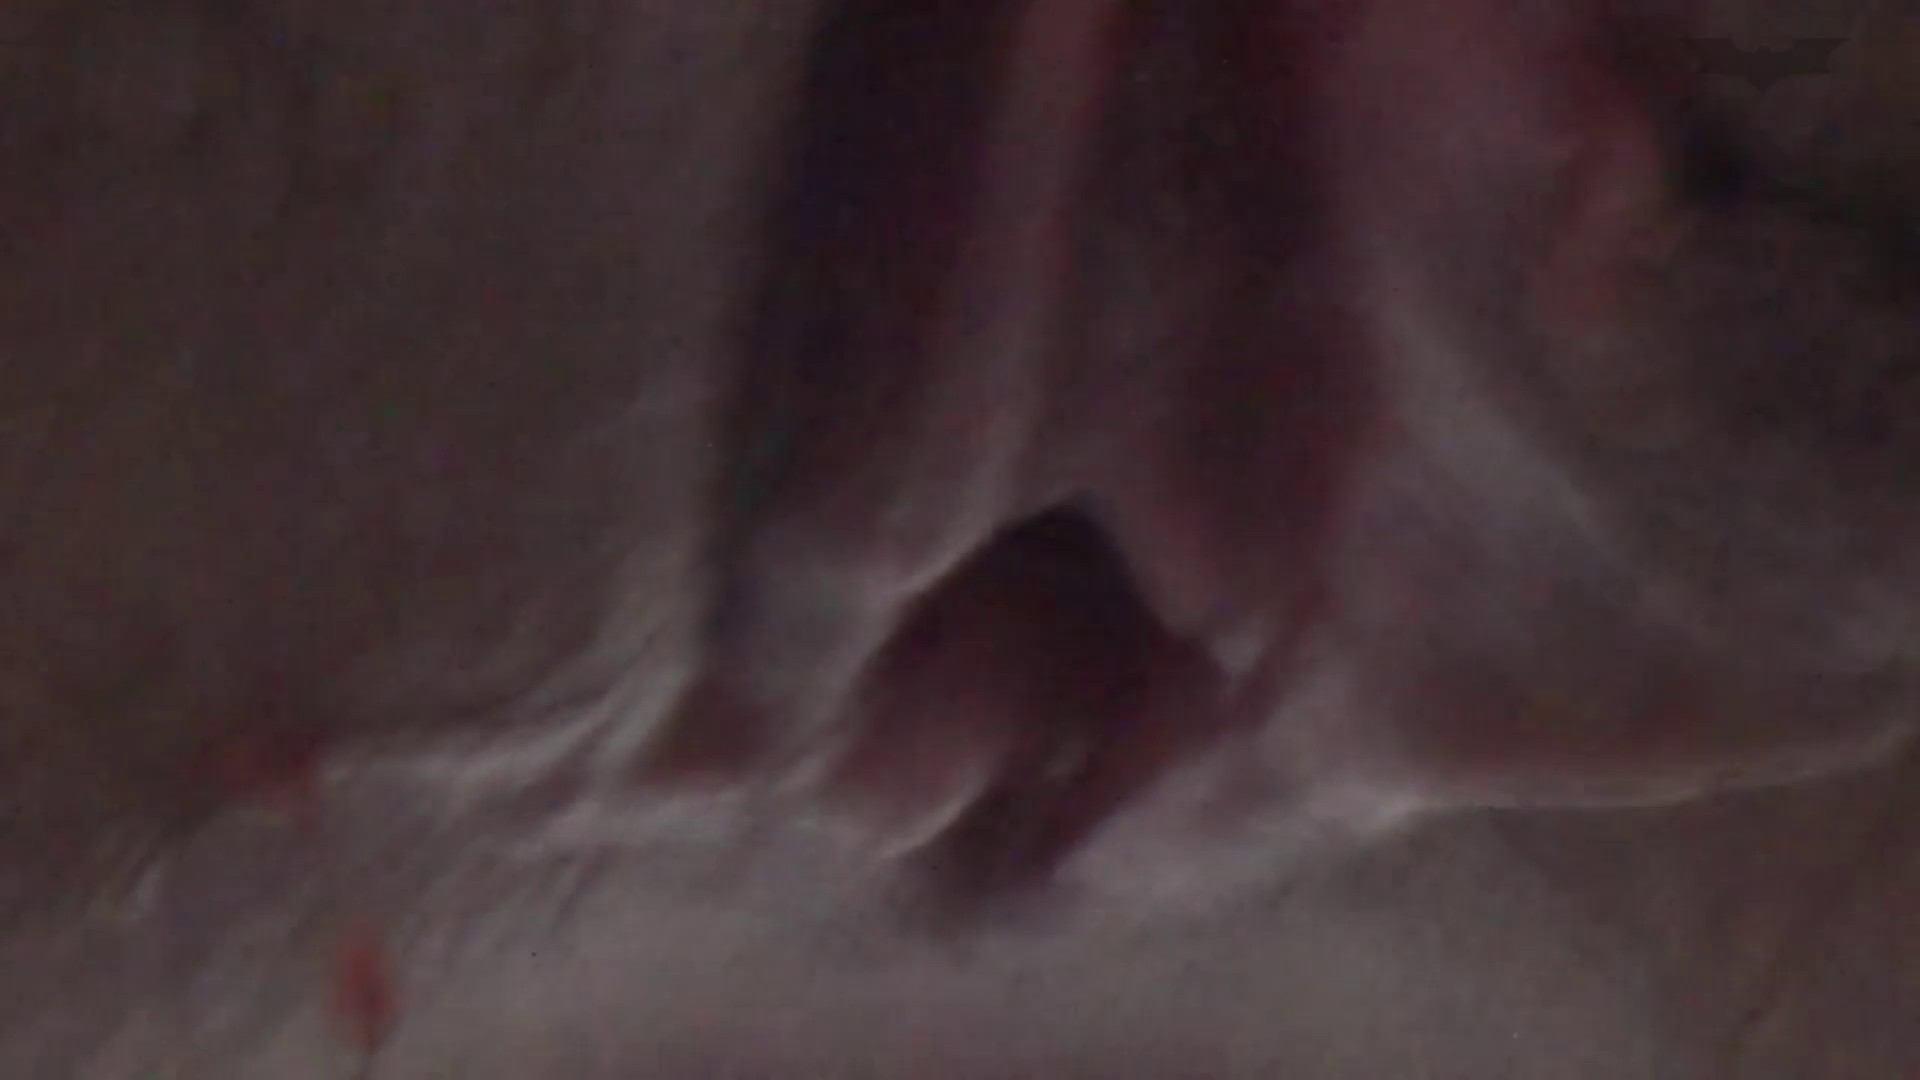 JD盗撮 美女の洗面所の秘密 Vol.42 美肌 AV無料 98画像 11